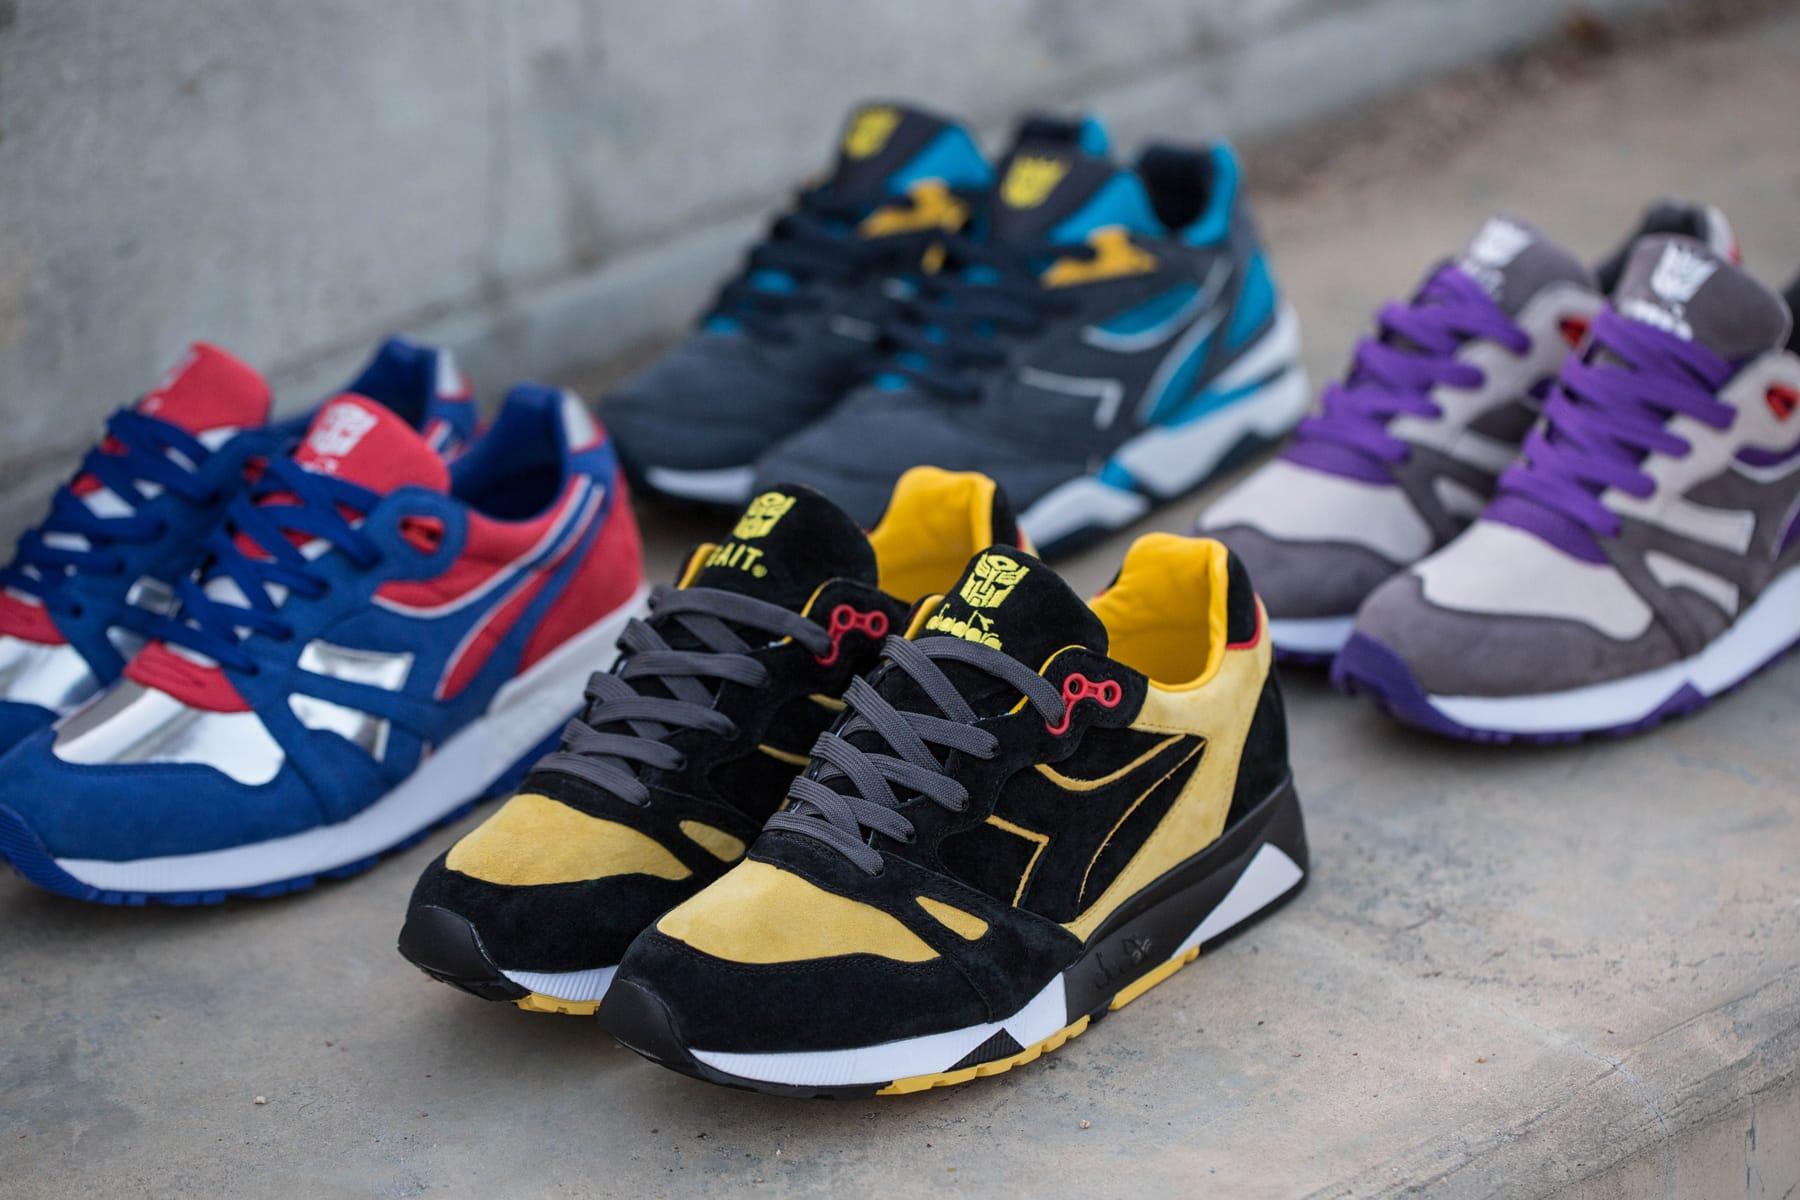 BAIT x Diadora x Transformers Sneaker